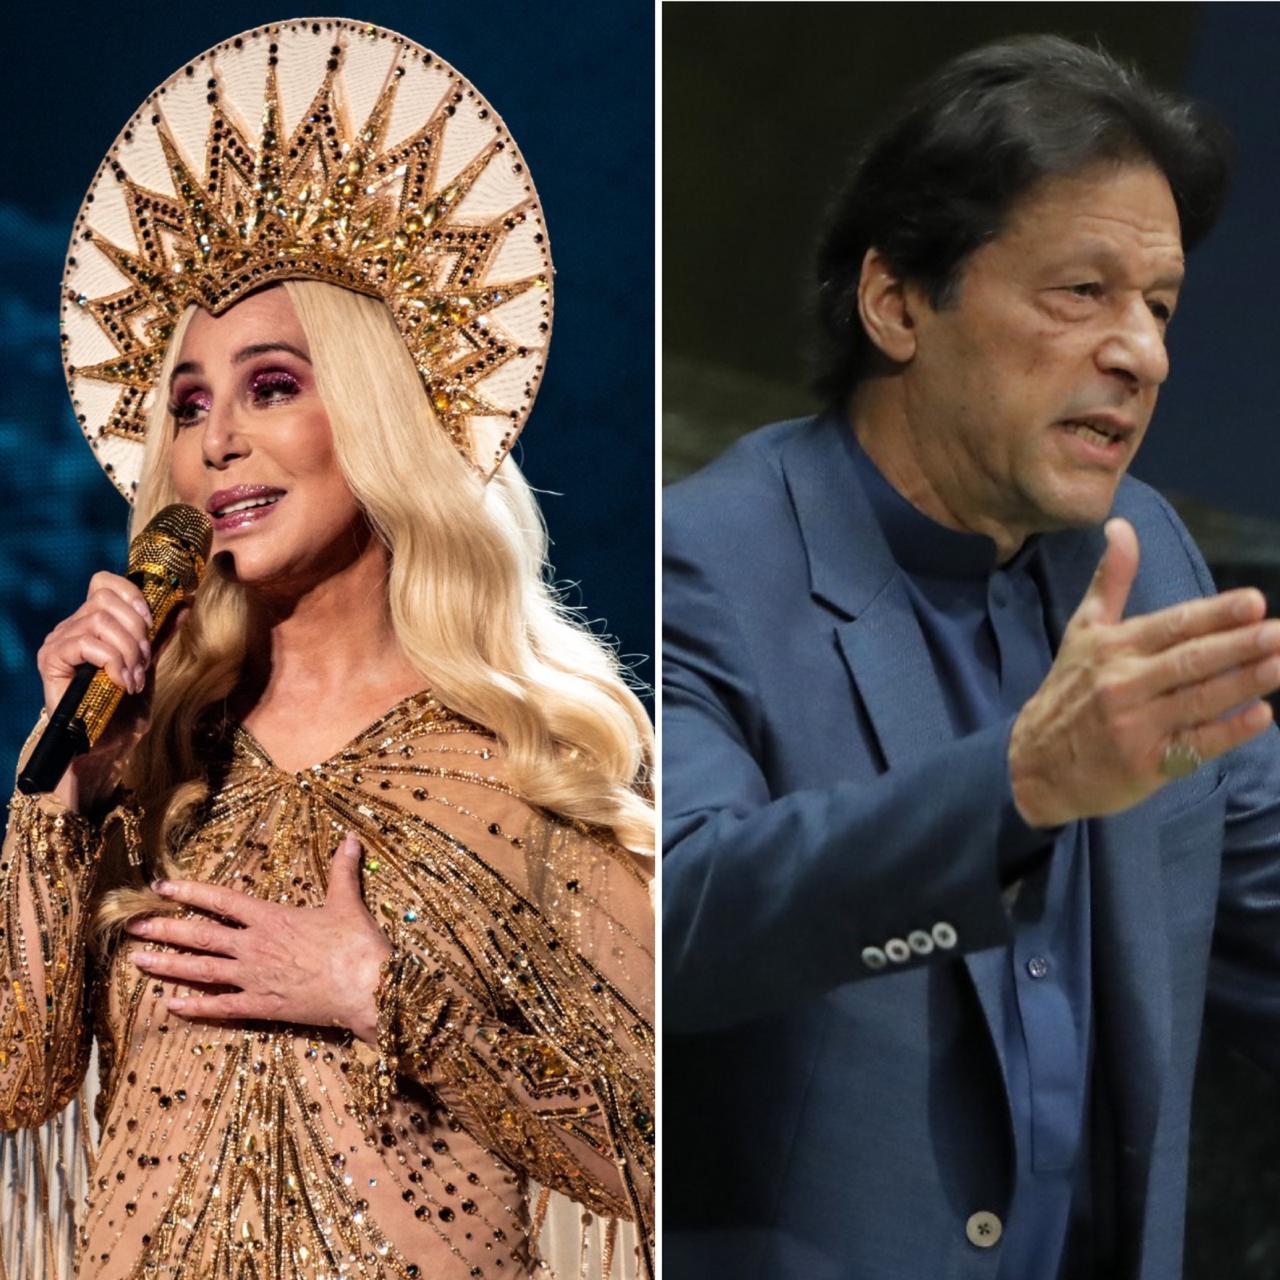 imran khan has found a longtime fan in pop goddess cher